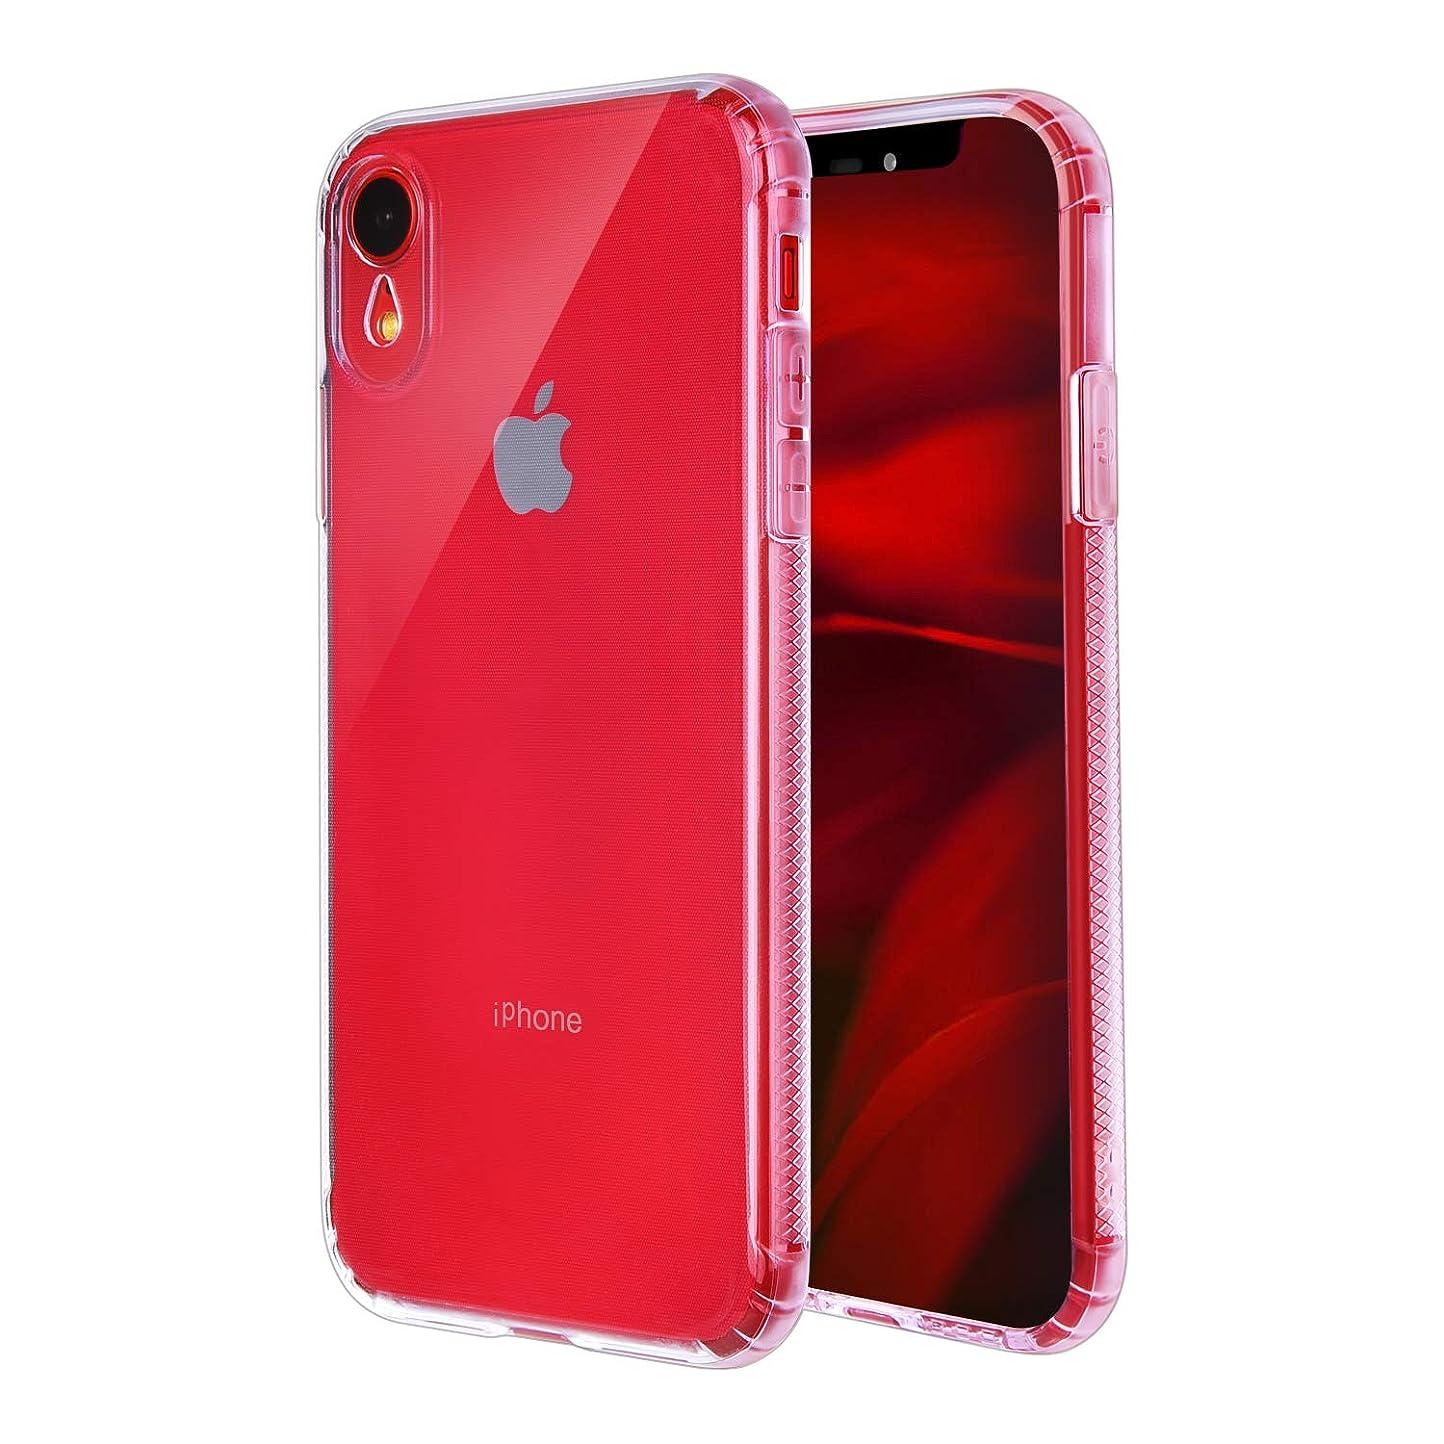 ZEAKOC iPhone XR ケース クリア TPU スマホカバー 耐衝撃 滑り止め 全透明 全面保護 薄型 指紋防止 ワイヤレス充電対応 ストラップホール付き(6.1インチ iPhone XR用)